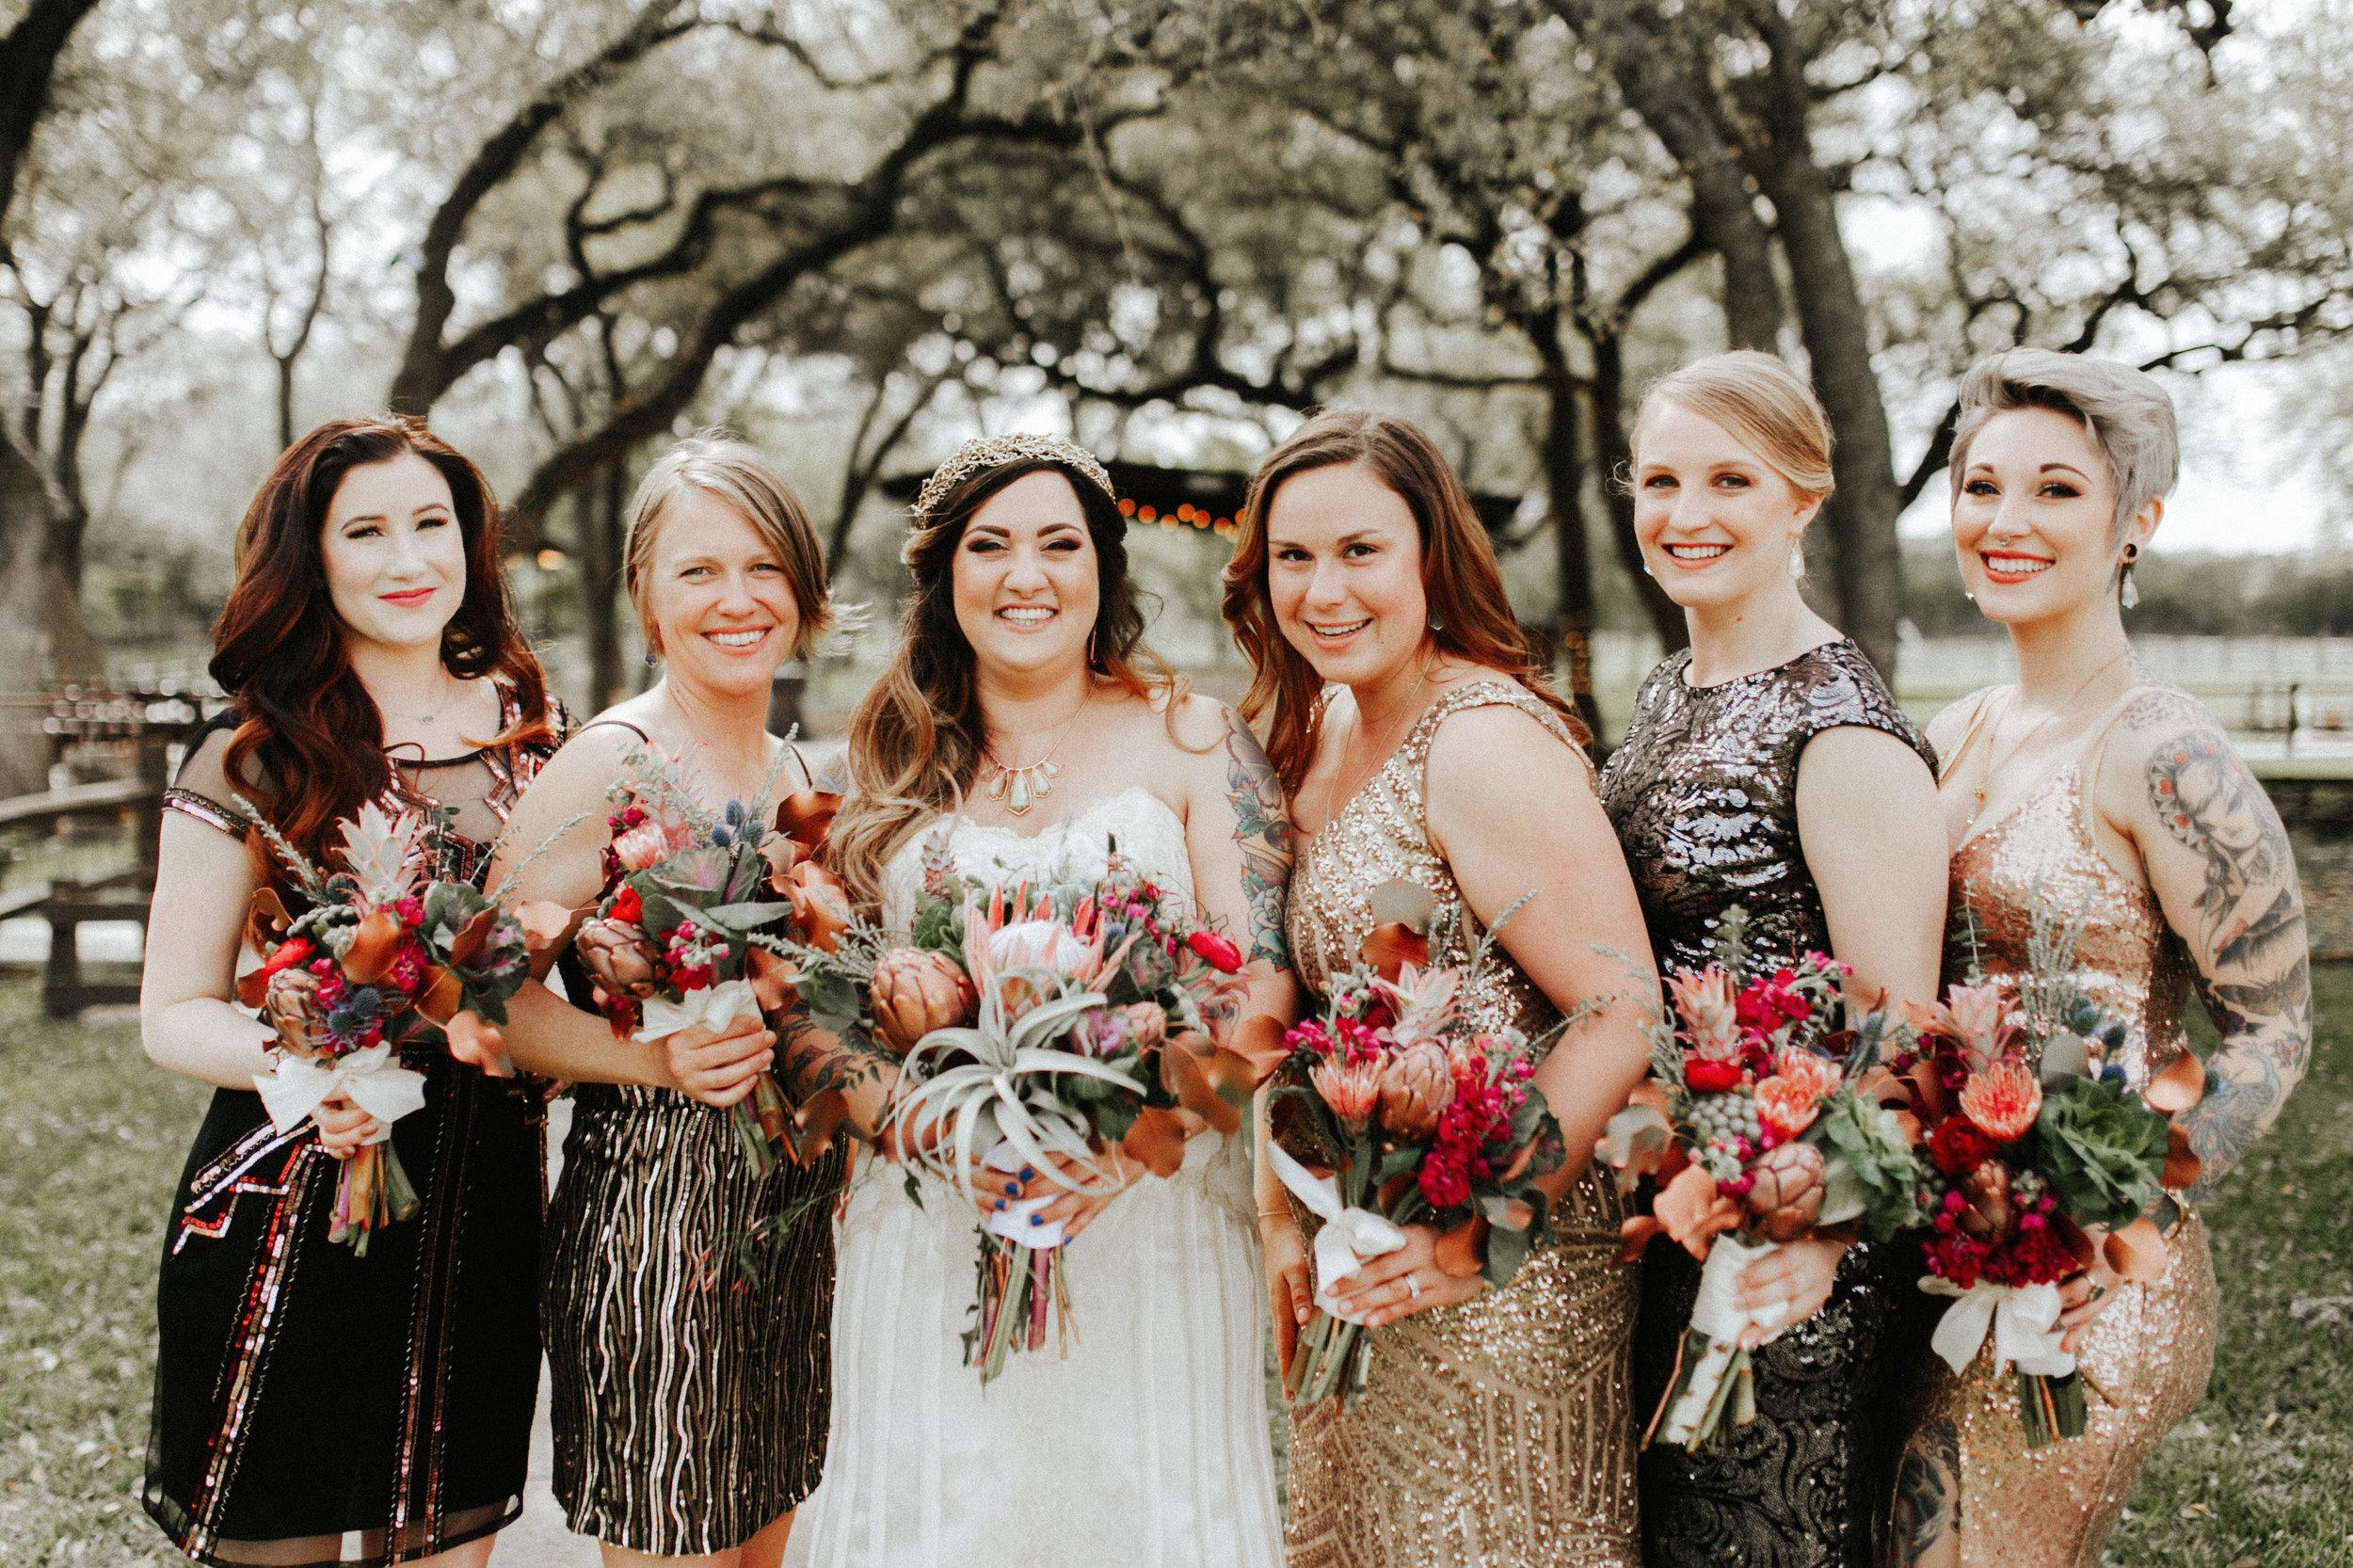 austin-wedding-photographer-27.jpg